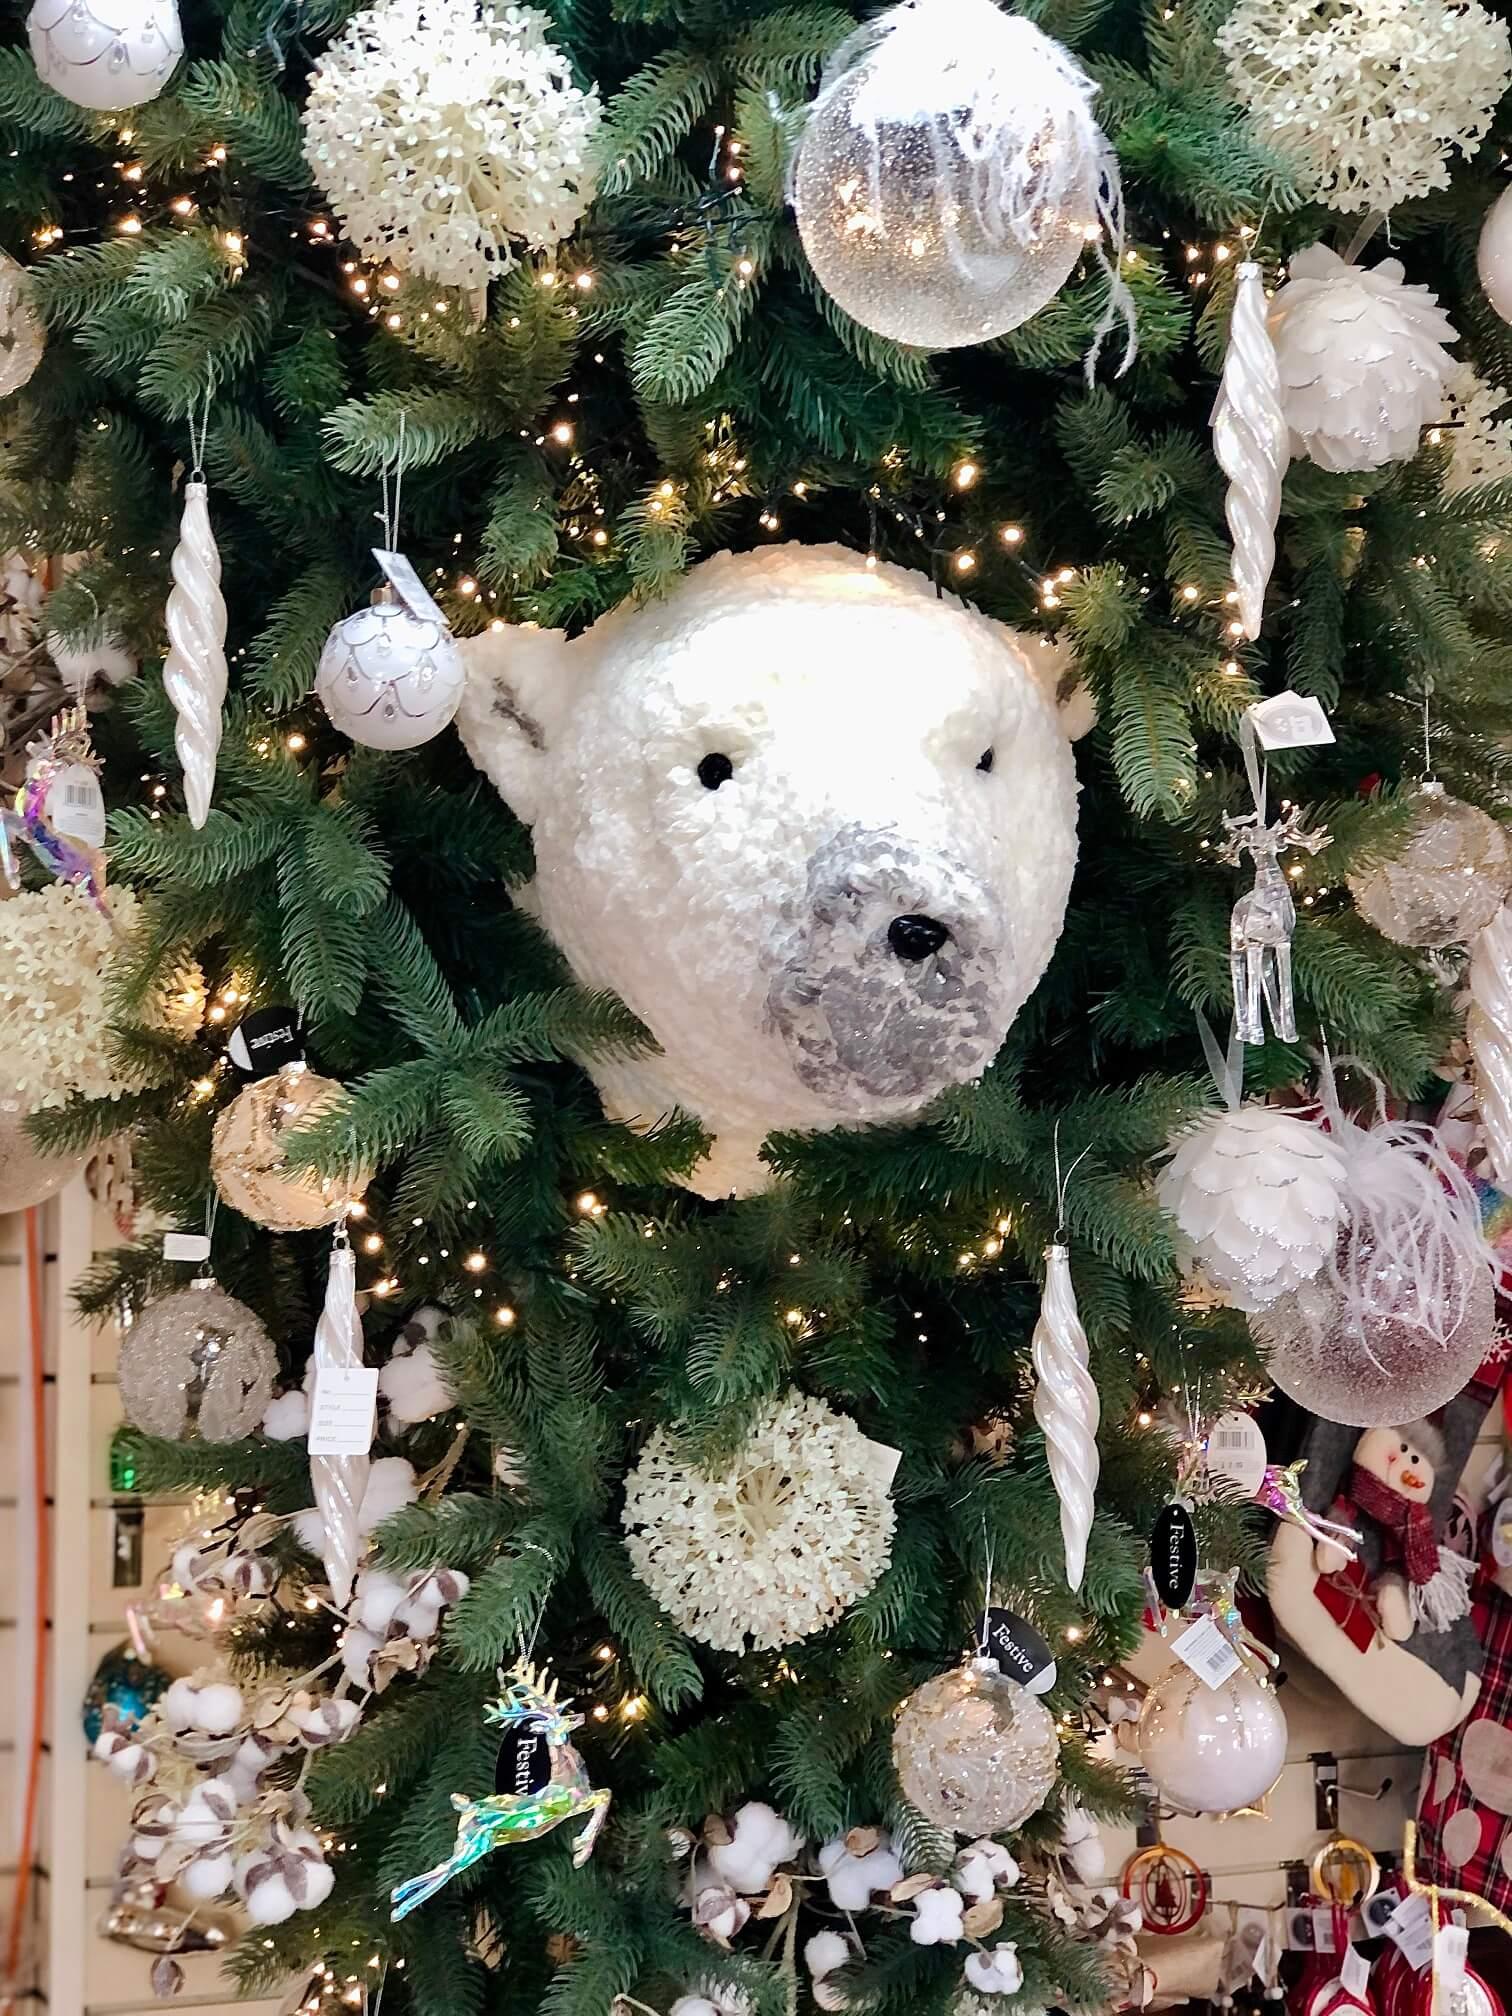 Polar Bear Head in Inverted Christmas Tree in Christmas Perks